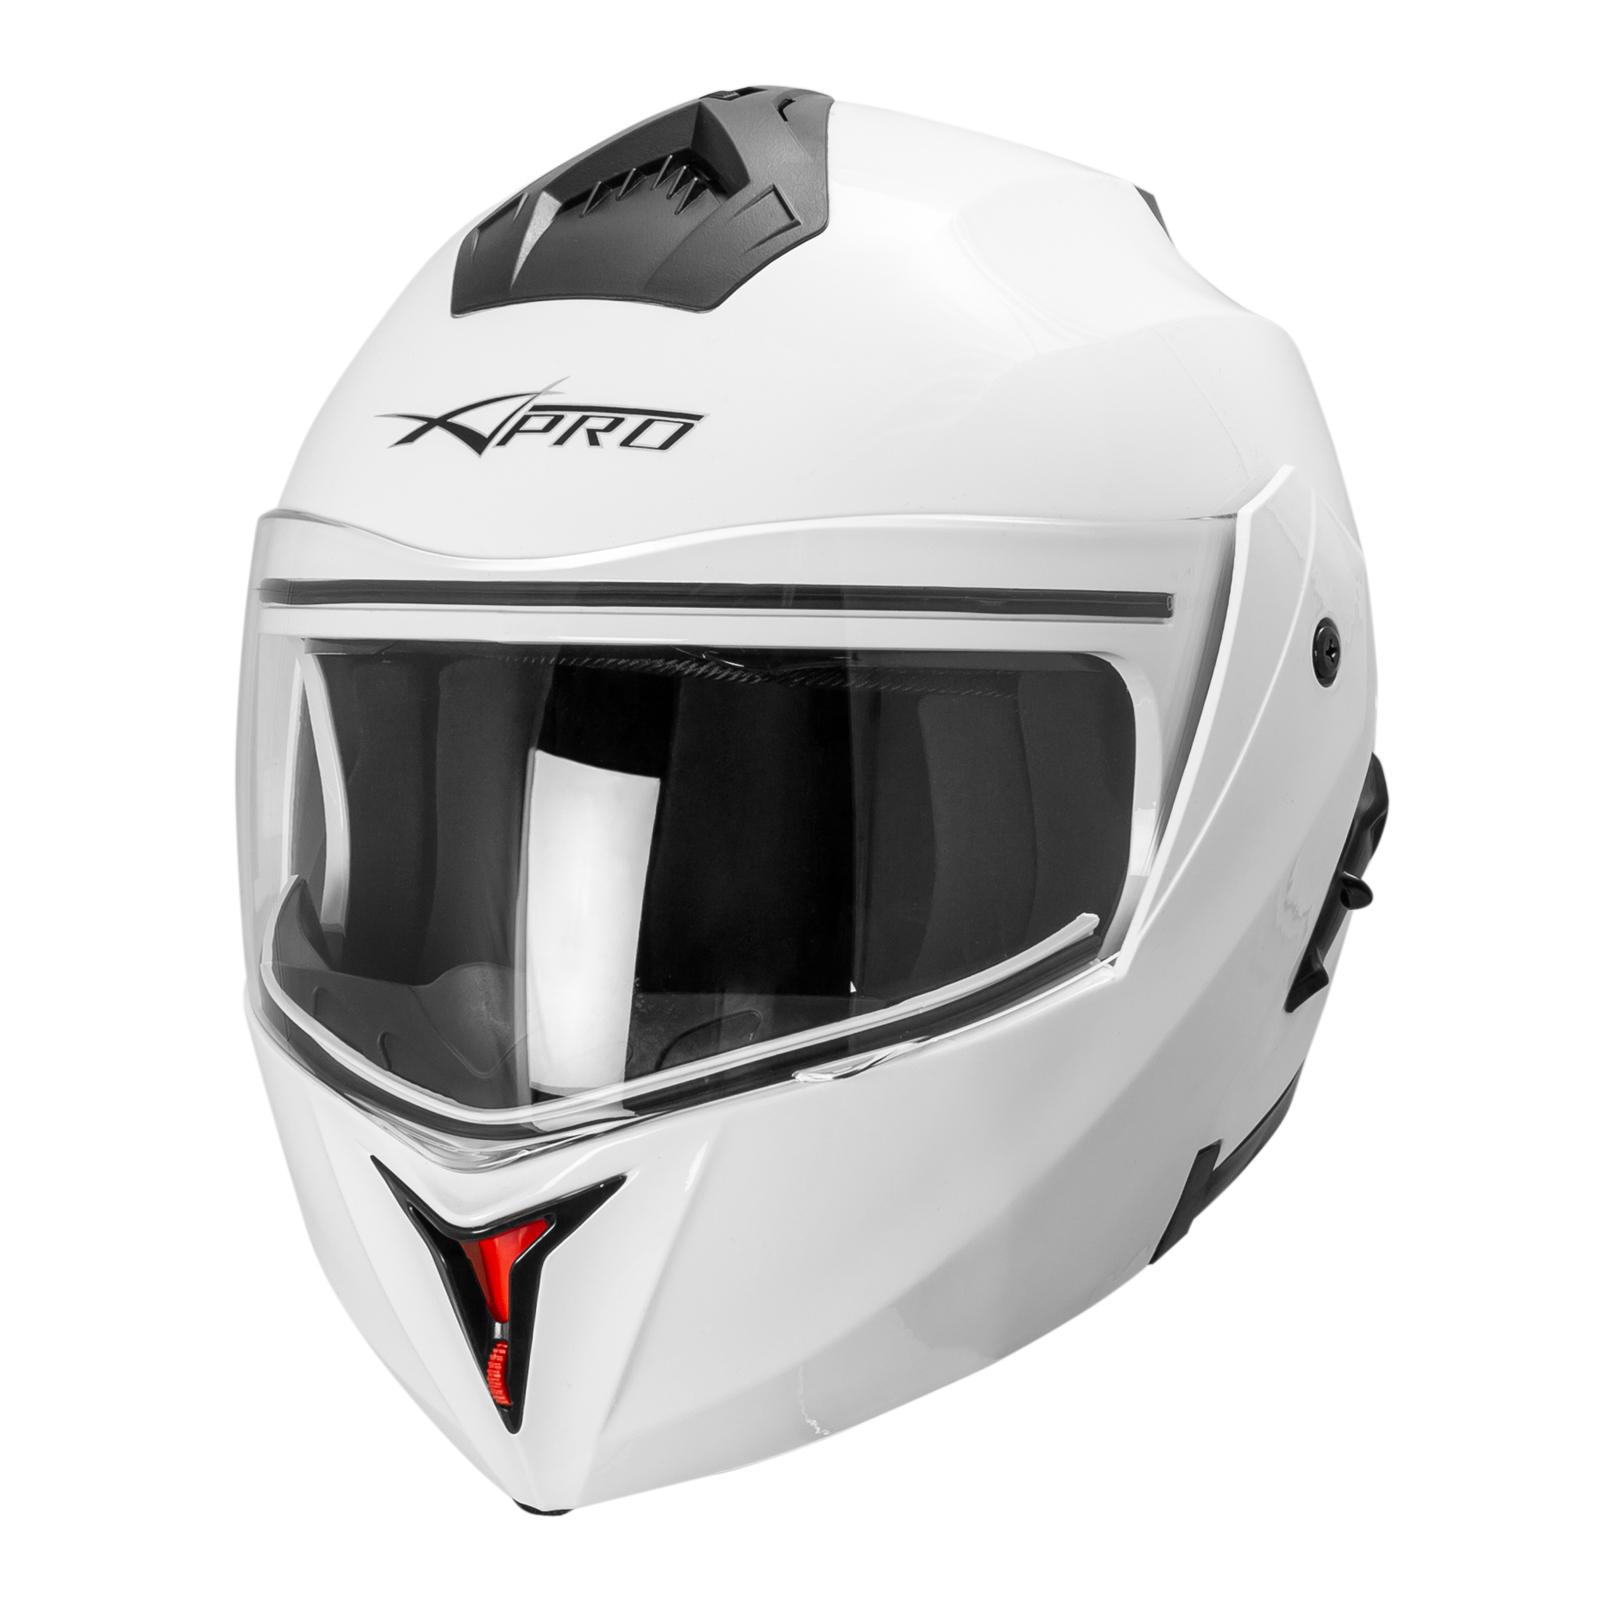 balance_helmet_motorcycle_white_a-pro_front2.jpg